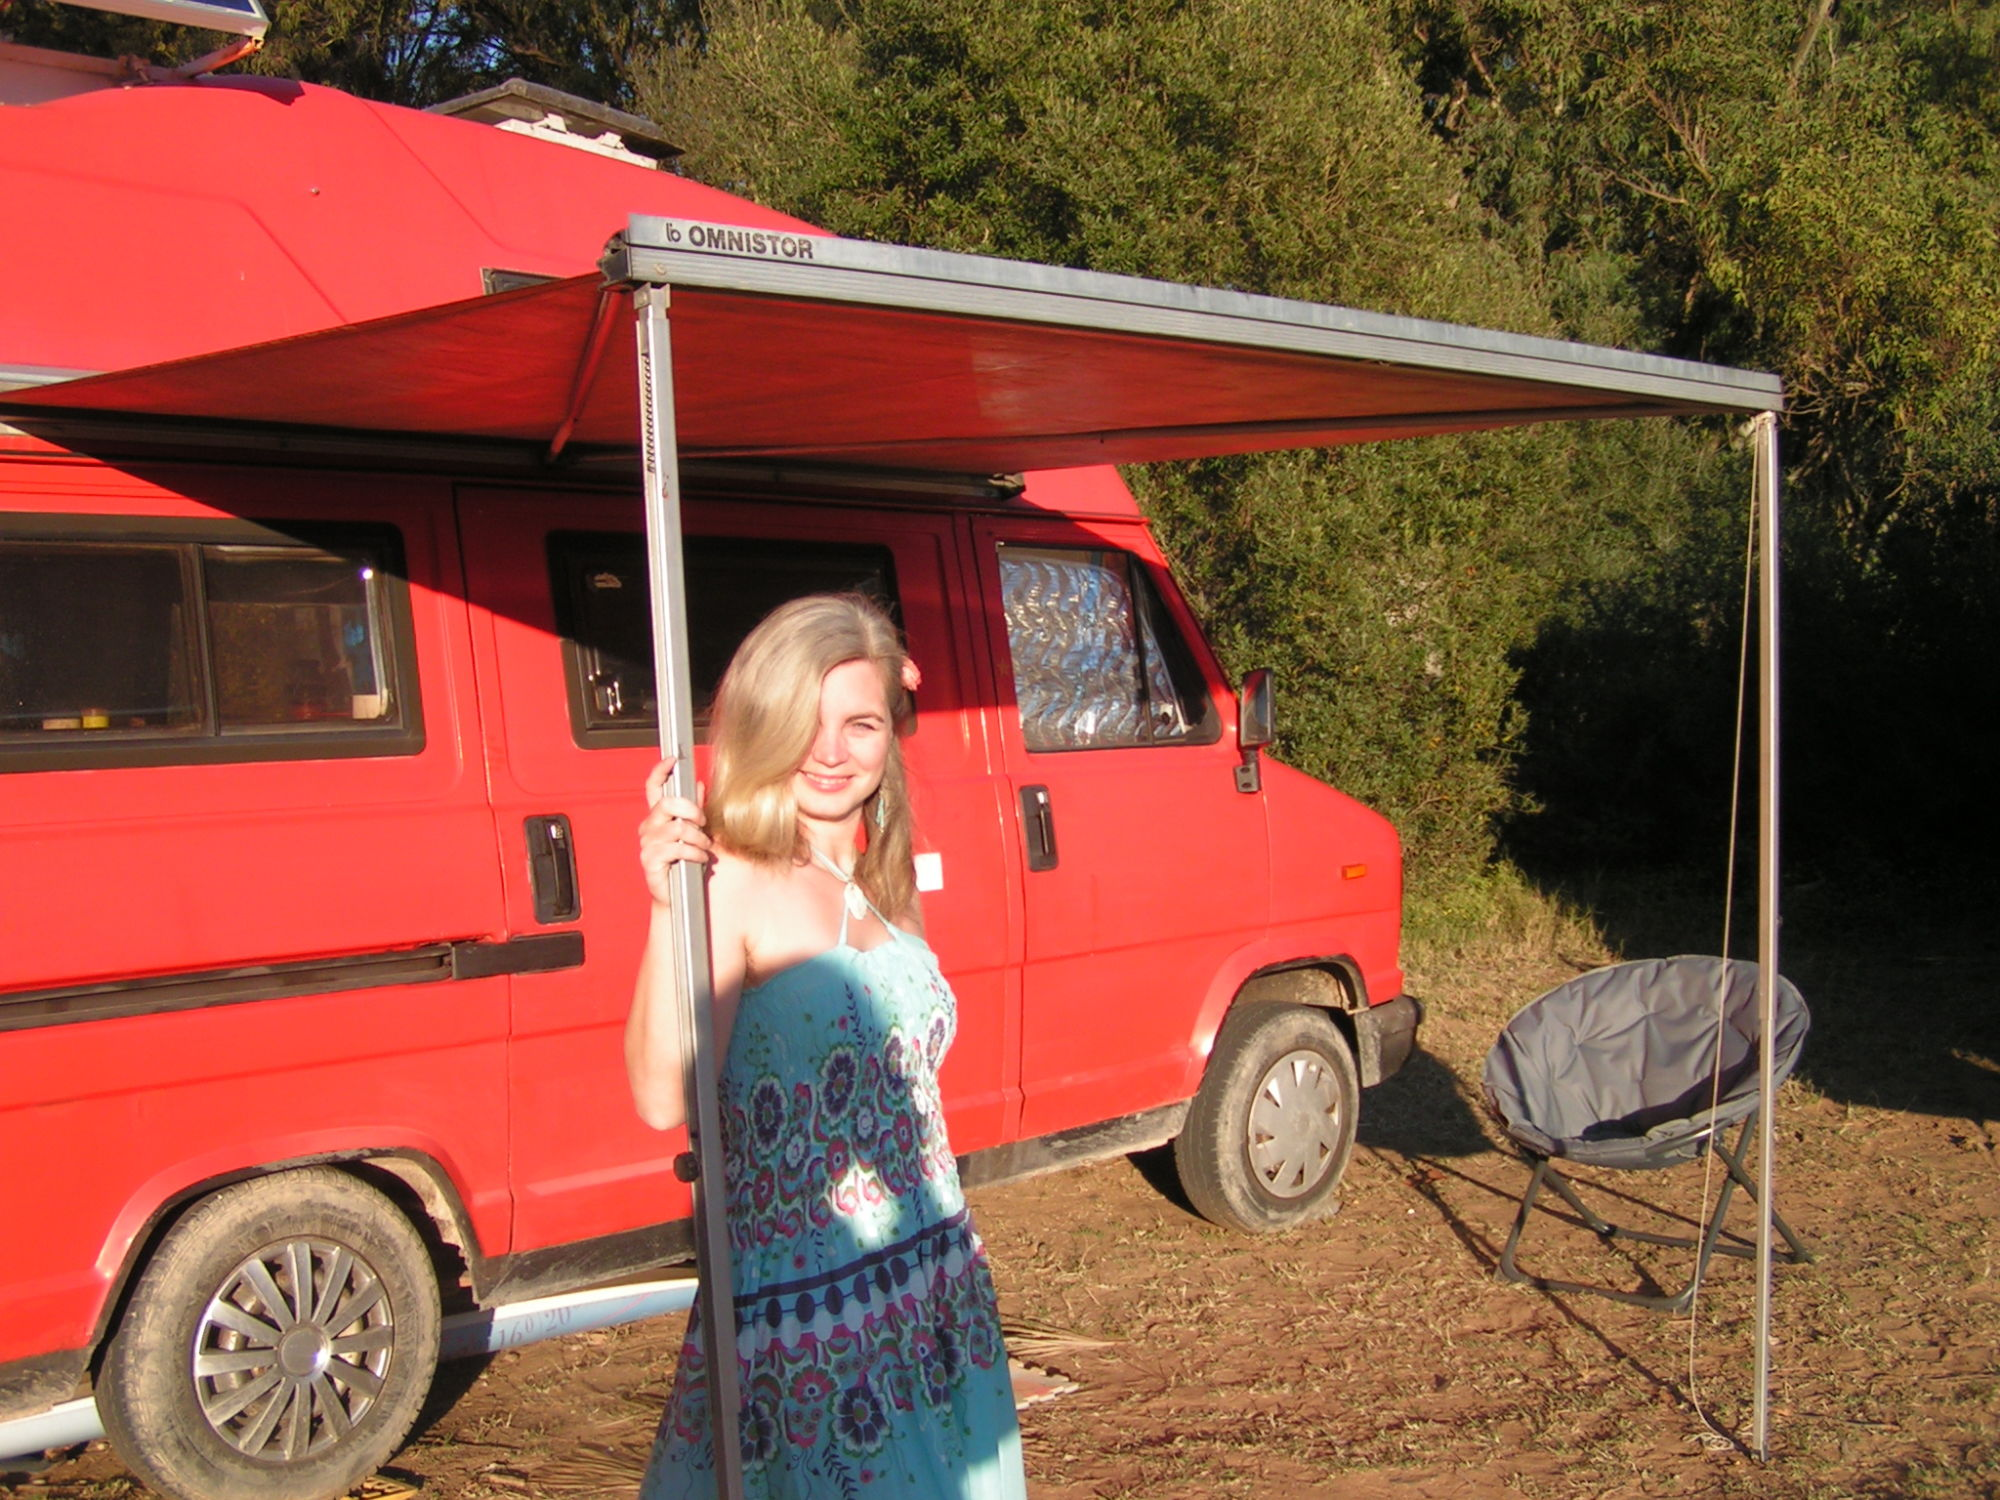 https://www.kempy-chaty.cz/sites/default/files/novinky/caravan_girl_rozhovor.jpg